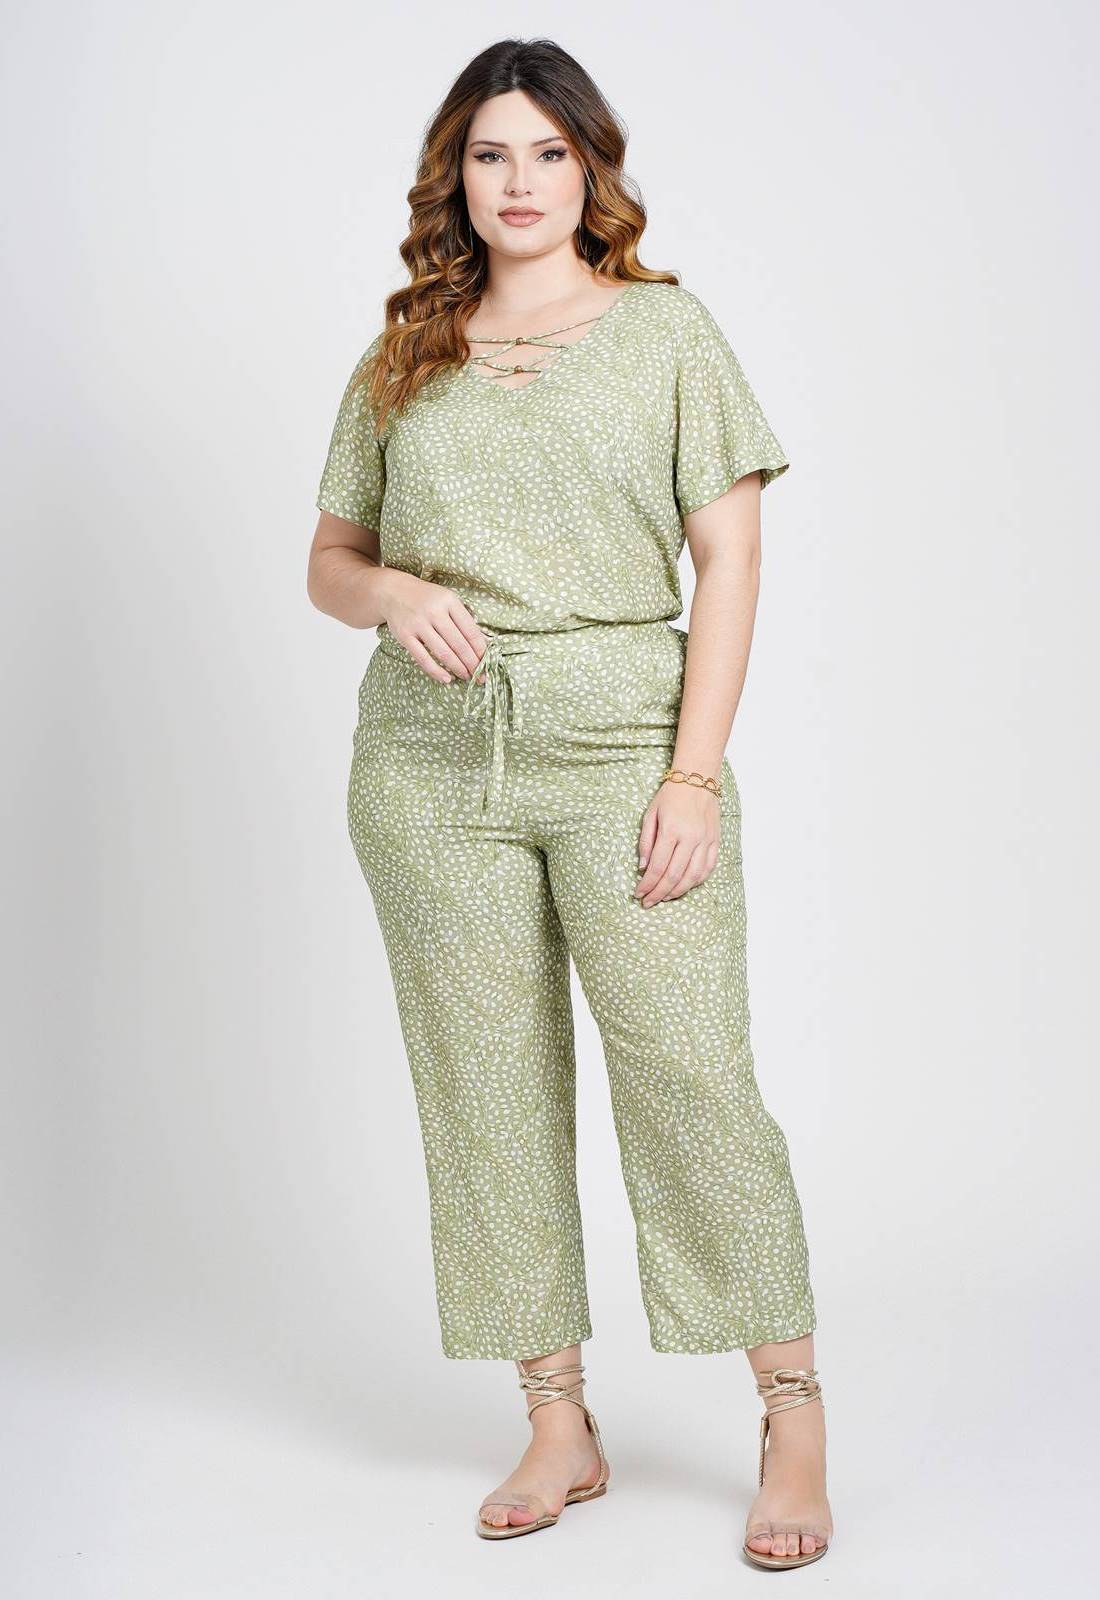 Conjunto plus size pantacourt blusa e calça verde Ref. U82221